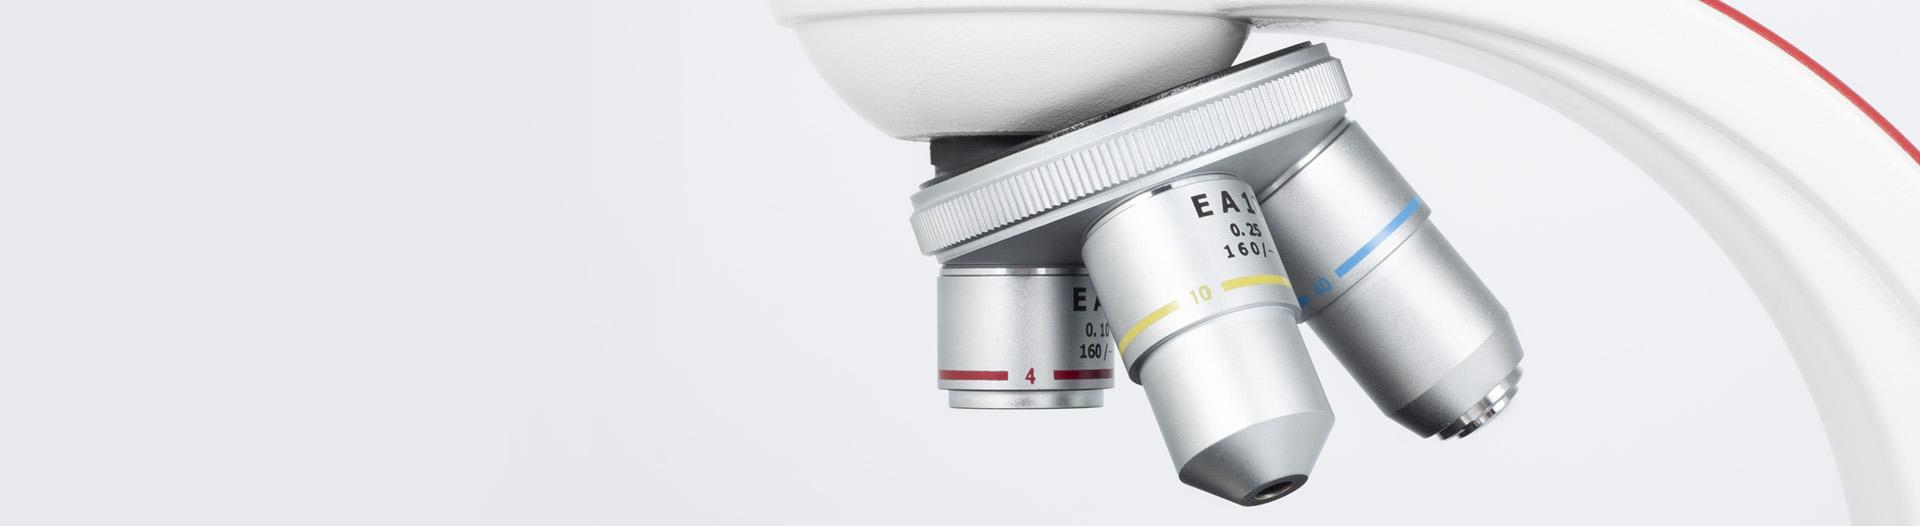 PM microscope Optics